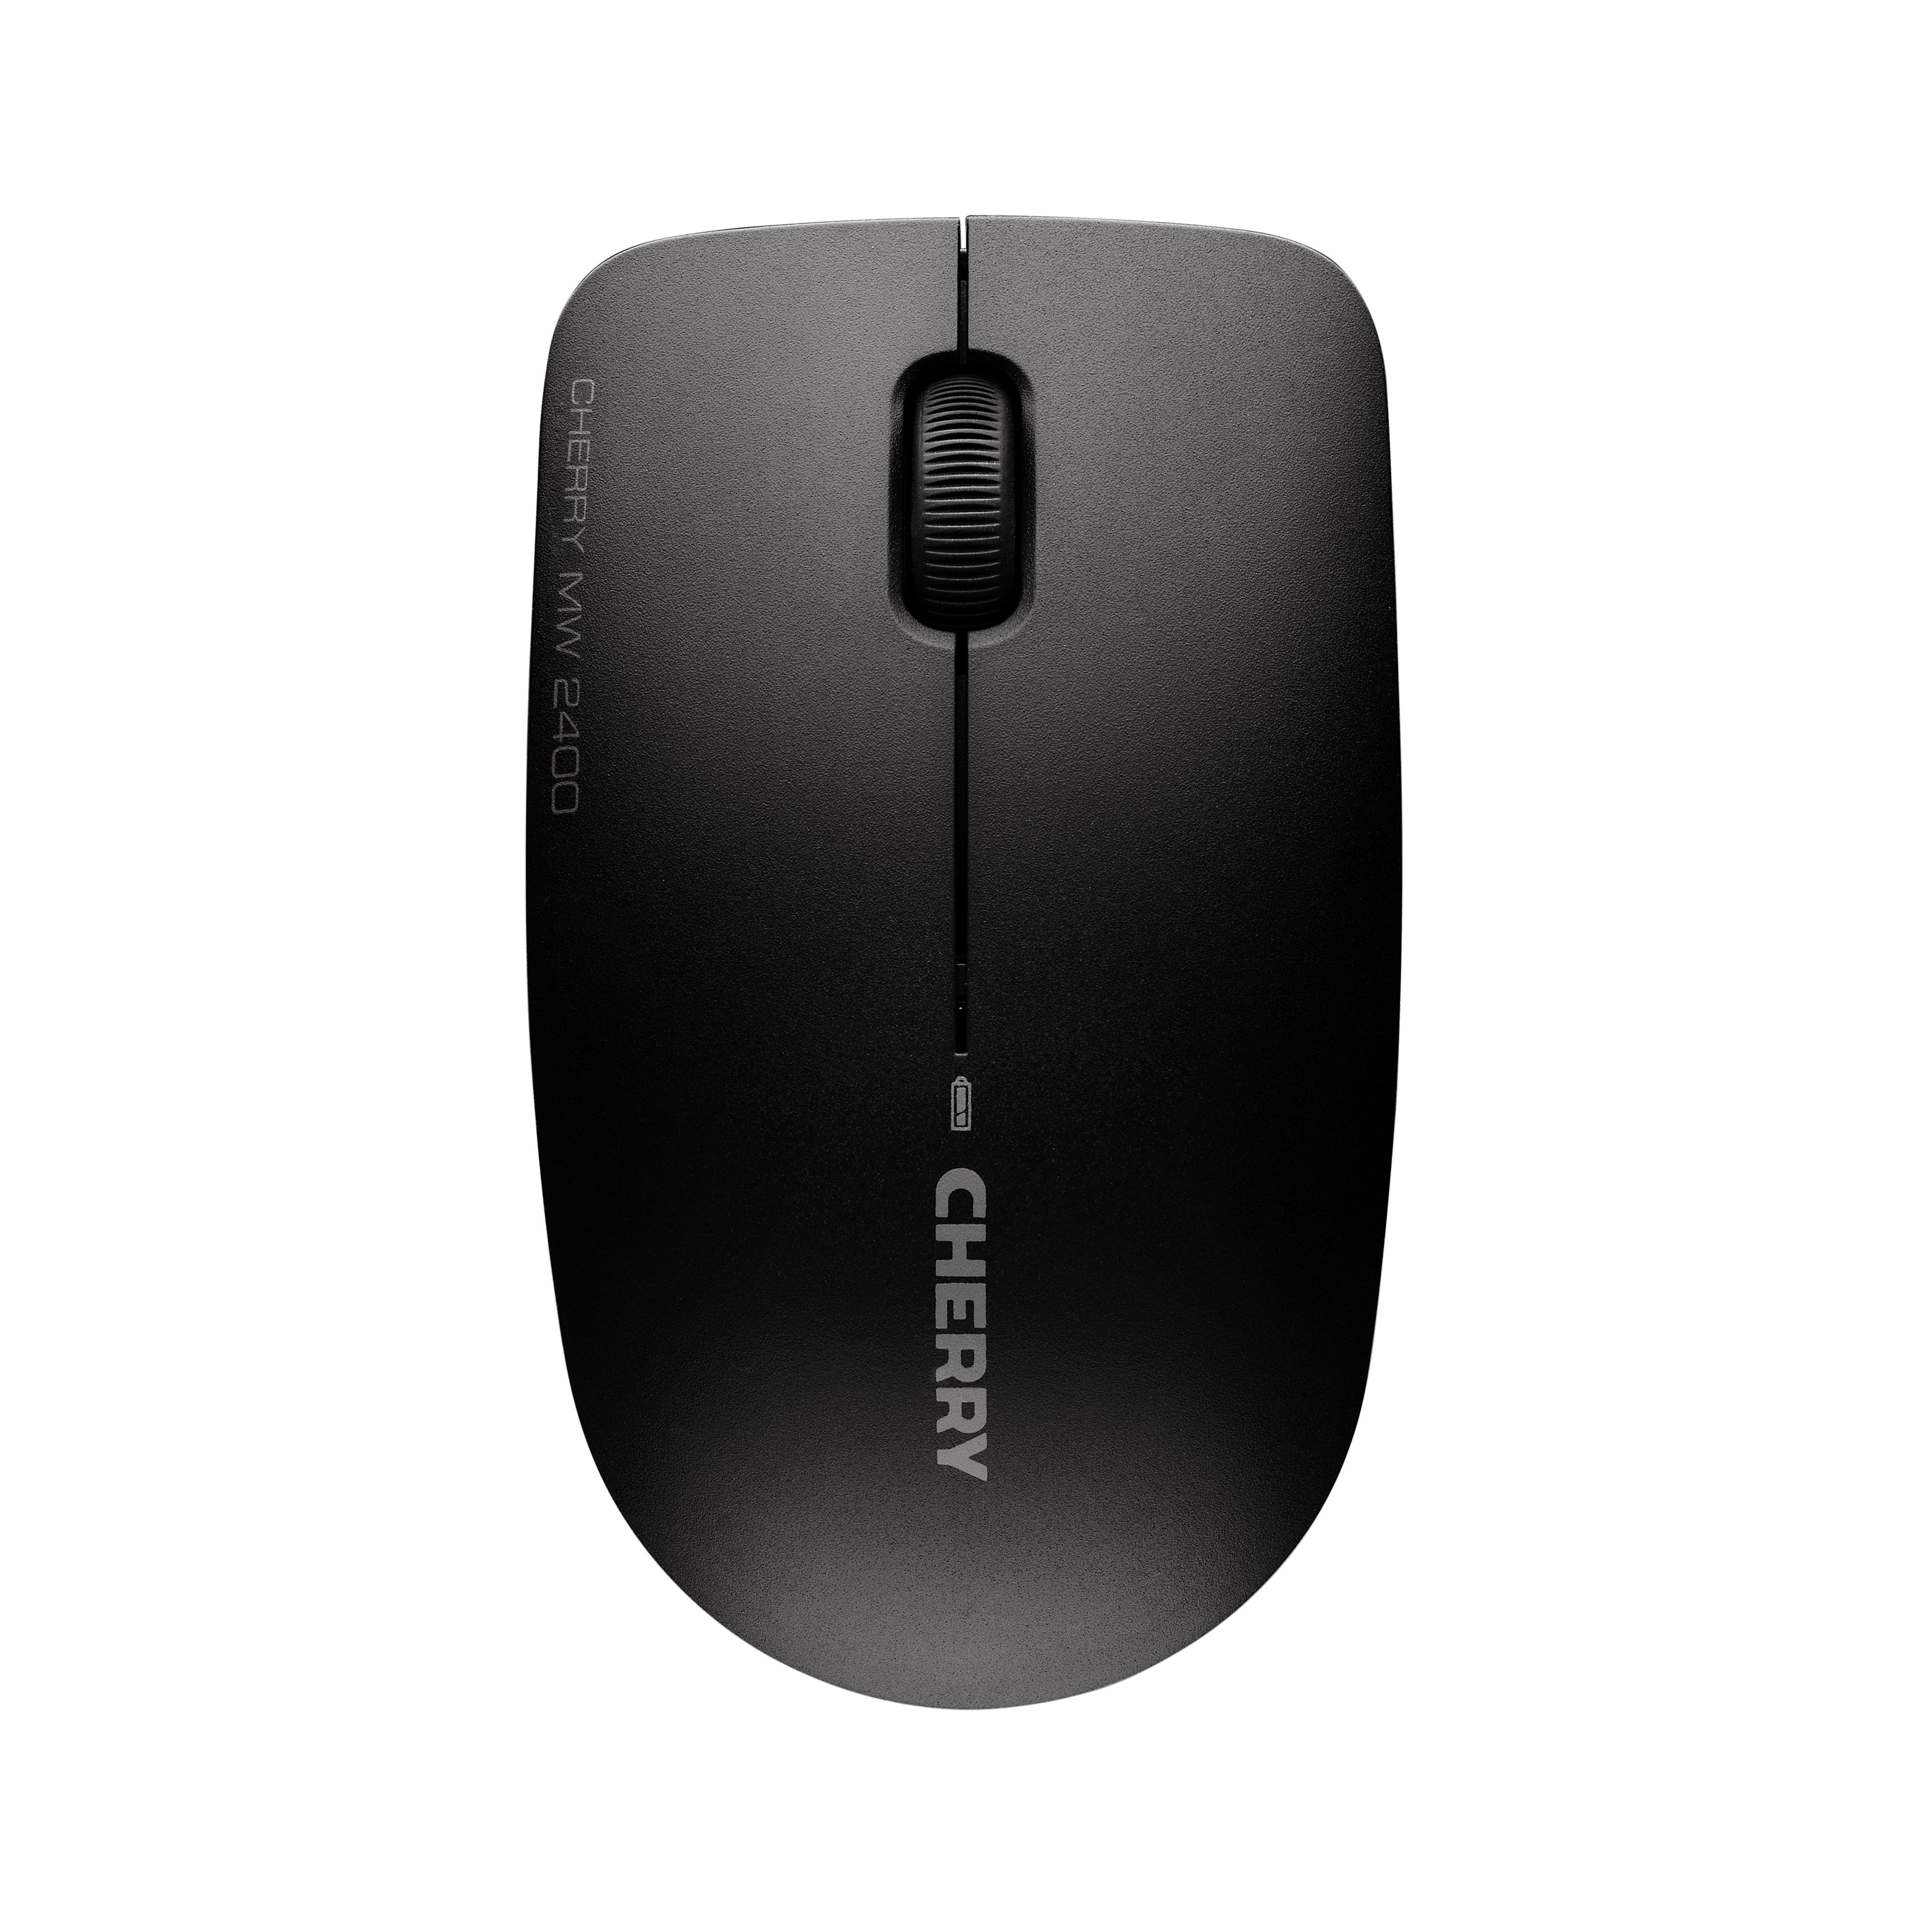 CHERRY MW2400 cordless Mouse black USB